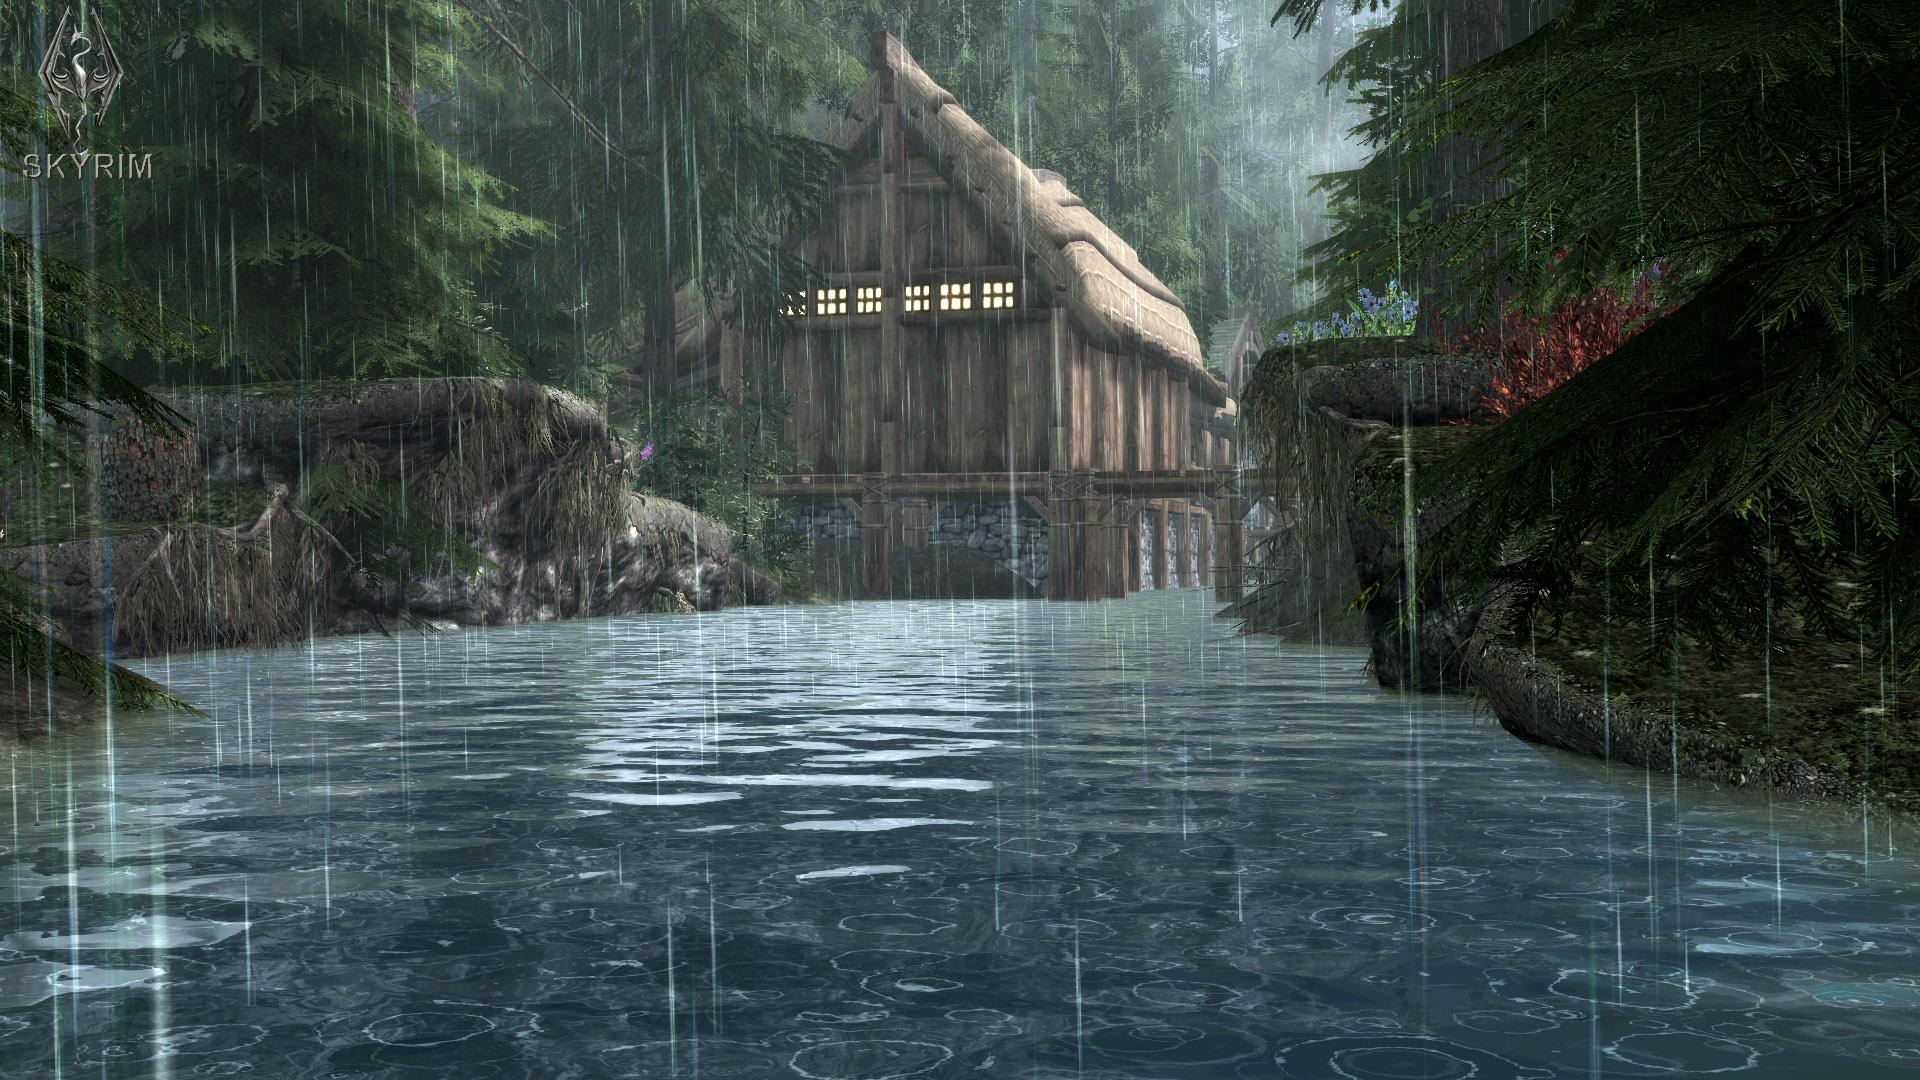 484. Ливень в Ривервуде.jpg - Elder Scrolls 5: Skyrim, the CBBE, Сборка-21